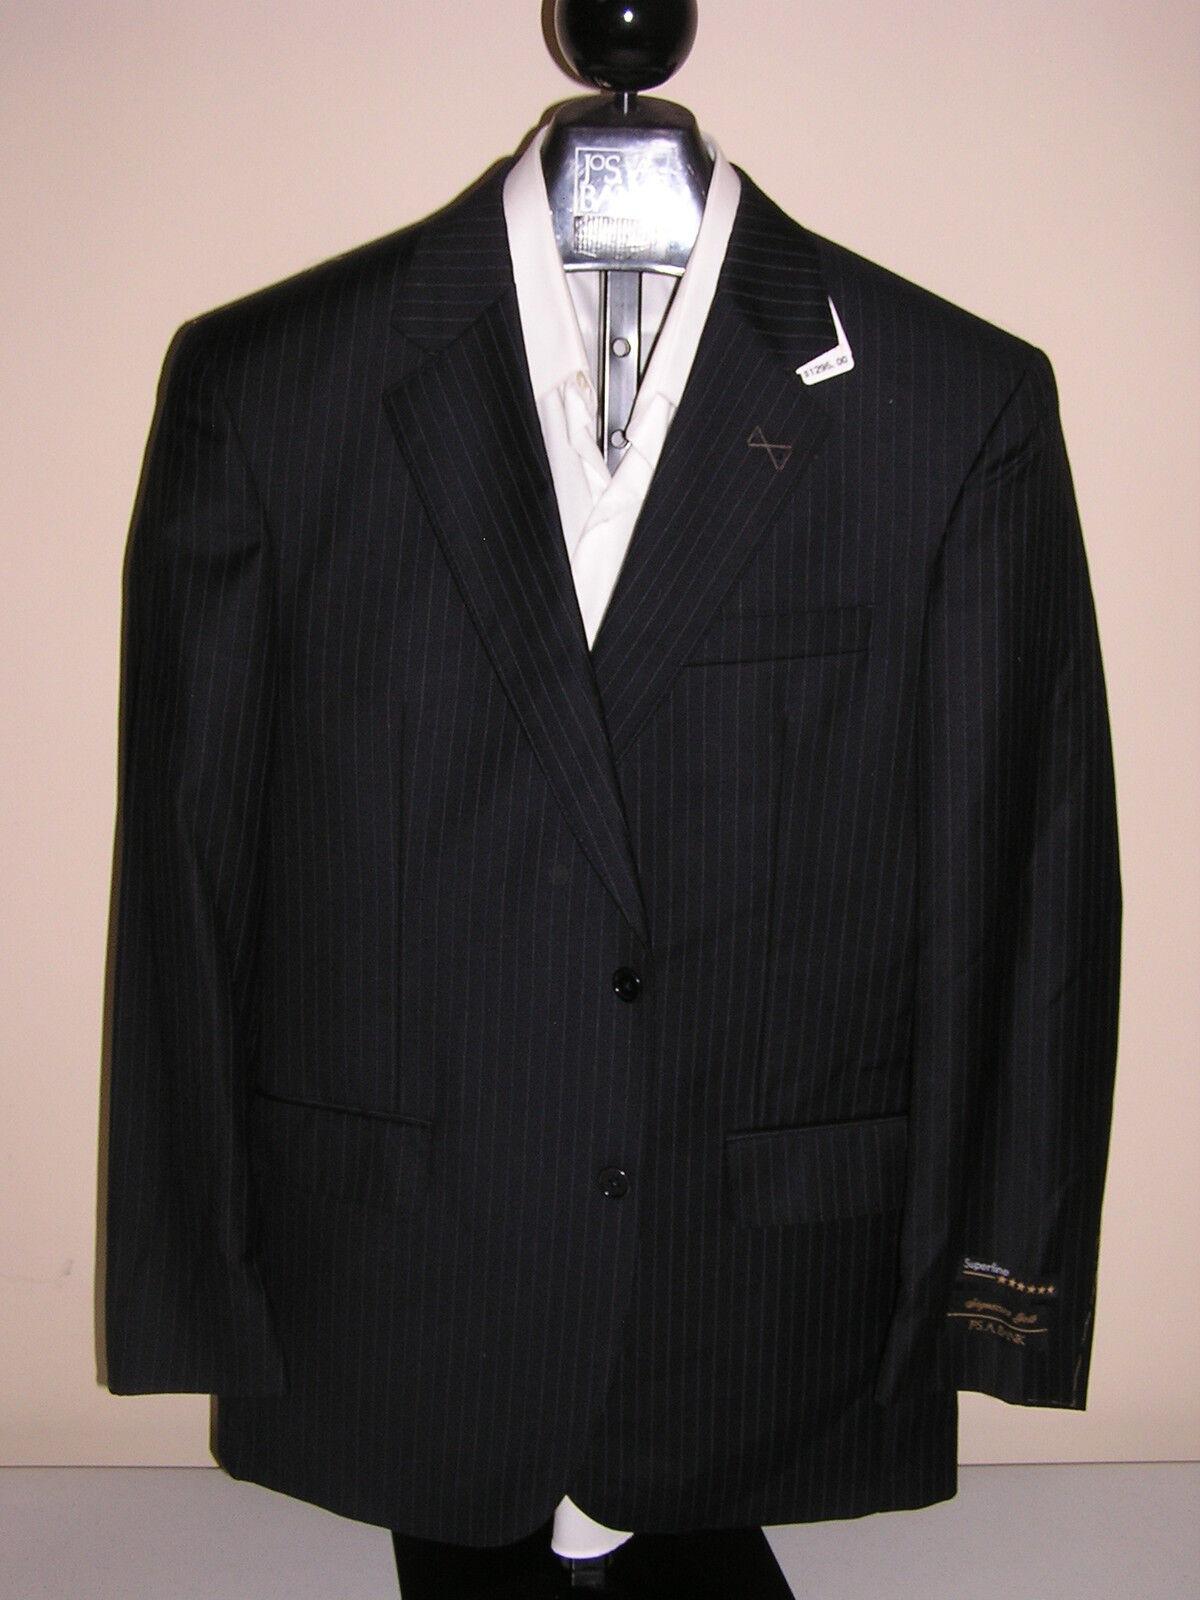 1295 new Jos A Bank Signature Gold  Navy stripe 2 button suit 40 L 34 W